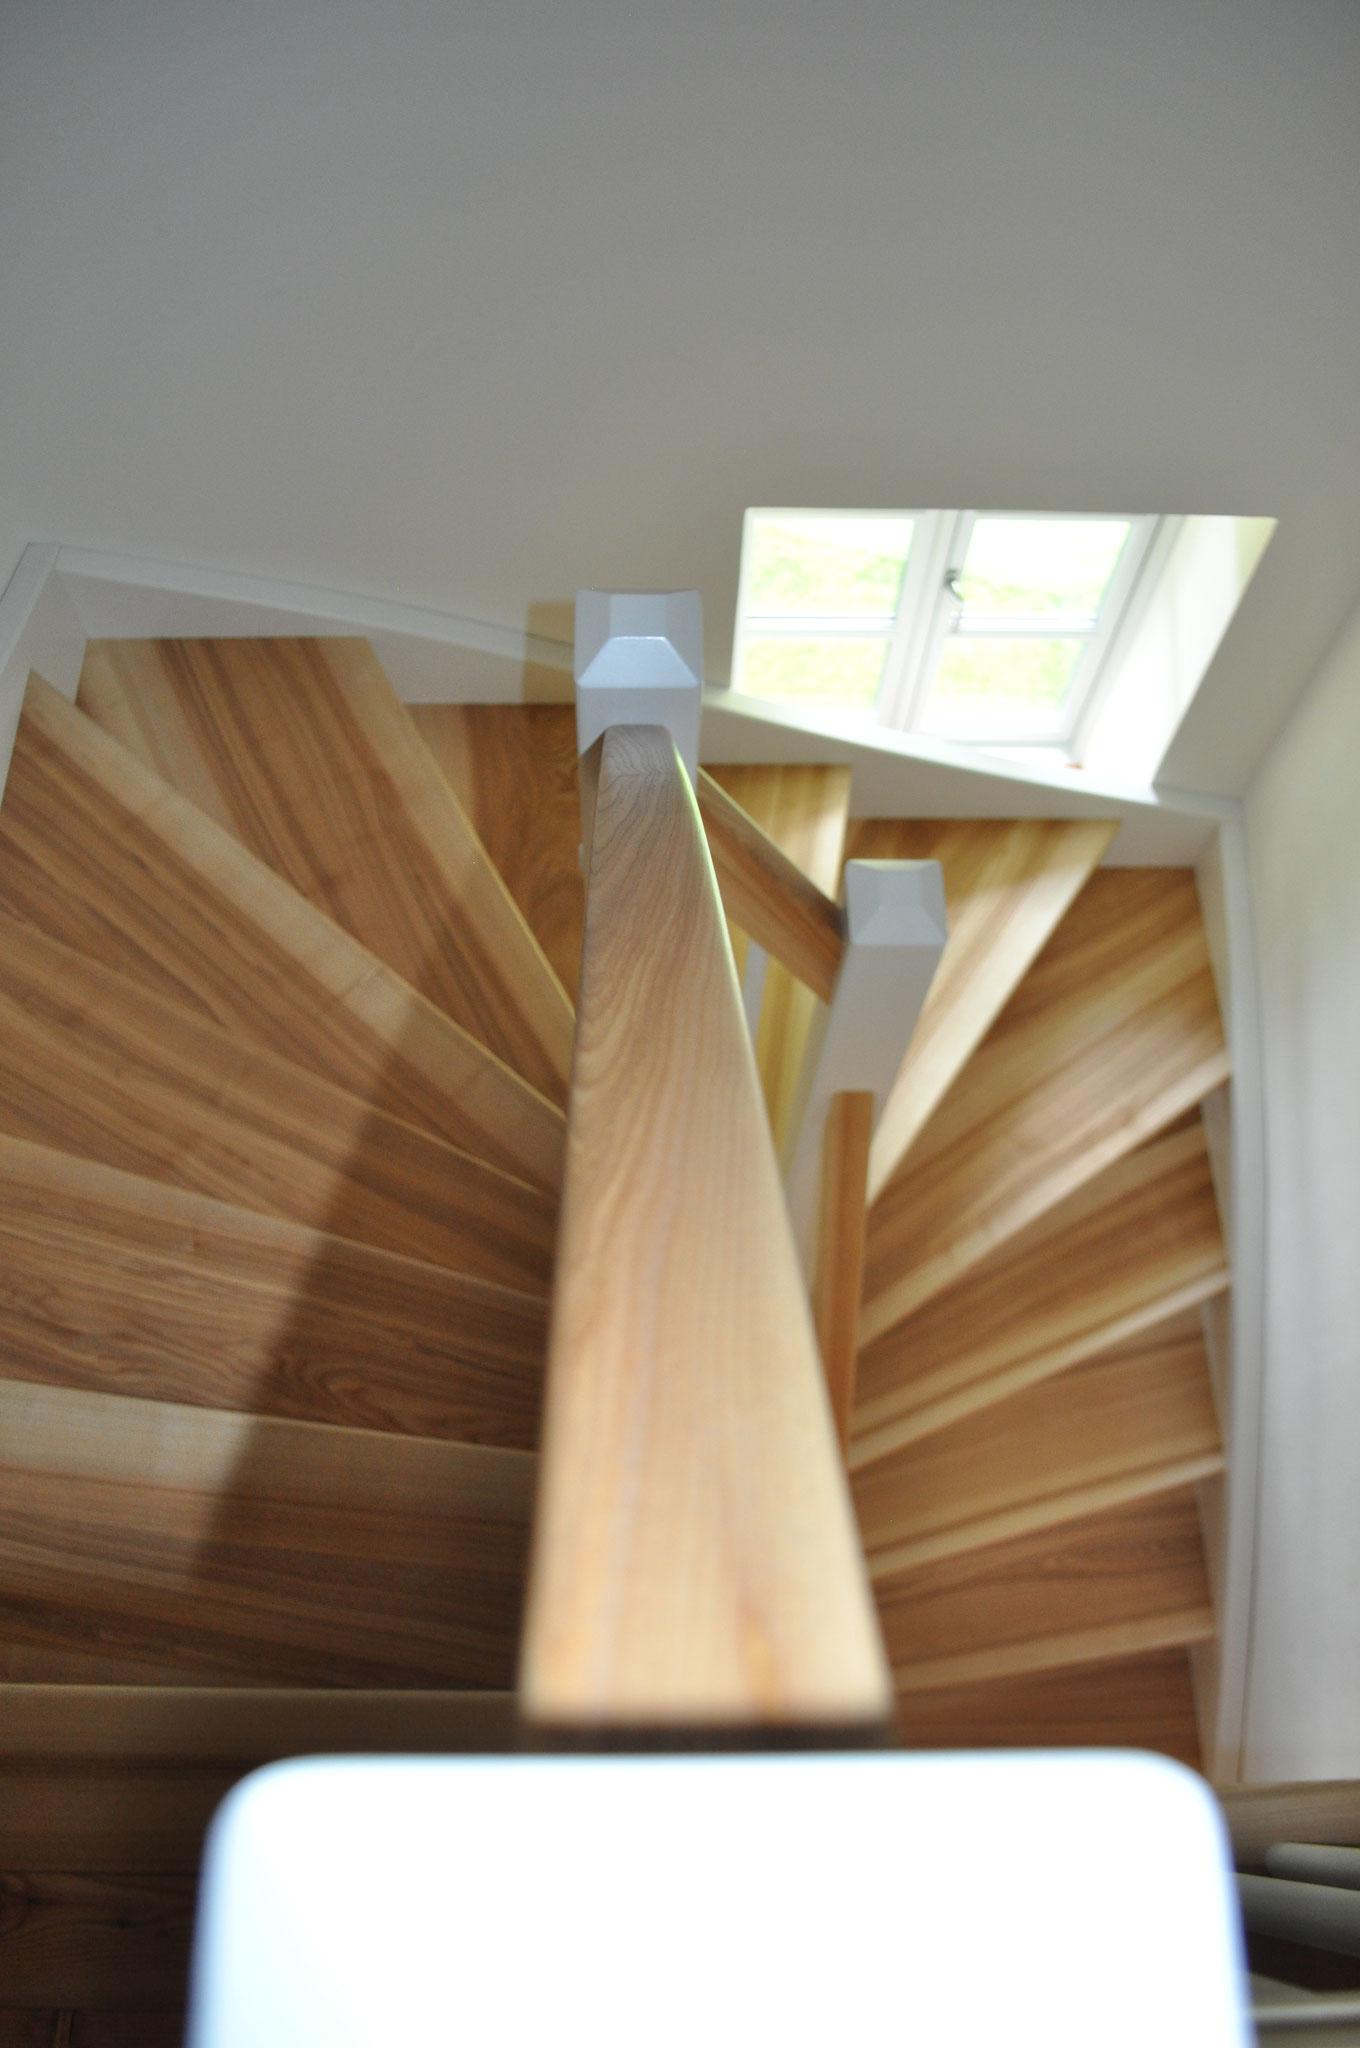 Holztreppe - edles Design